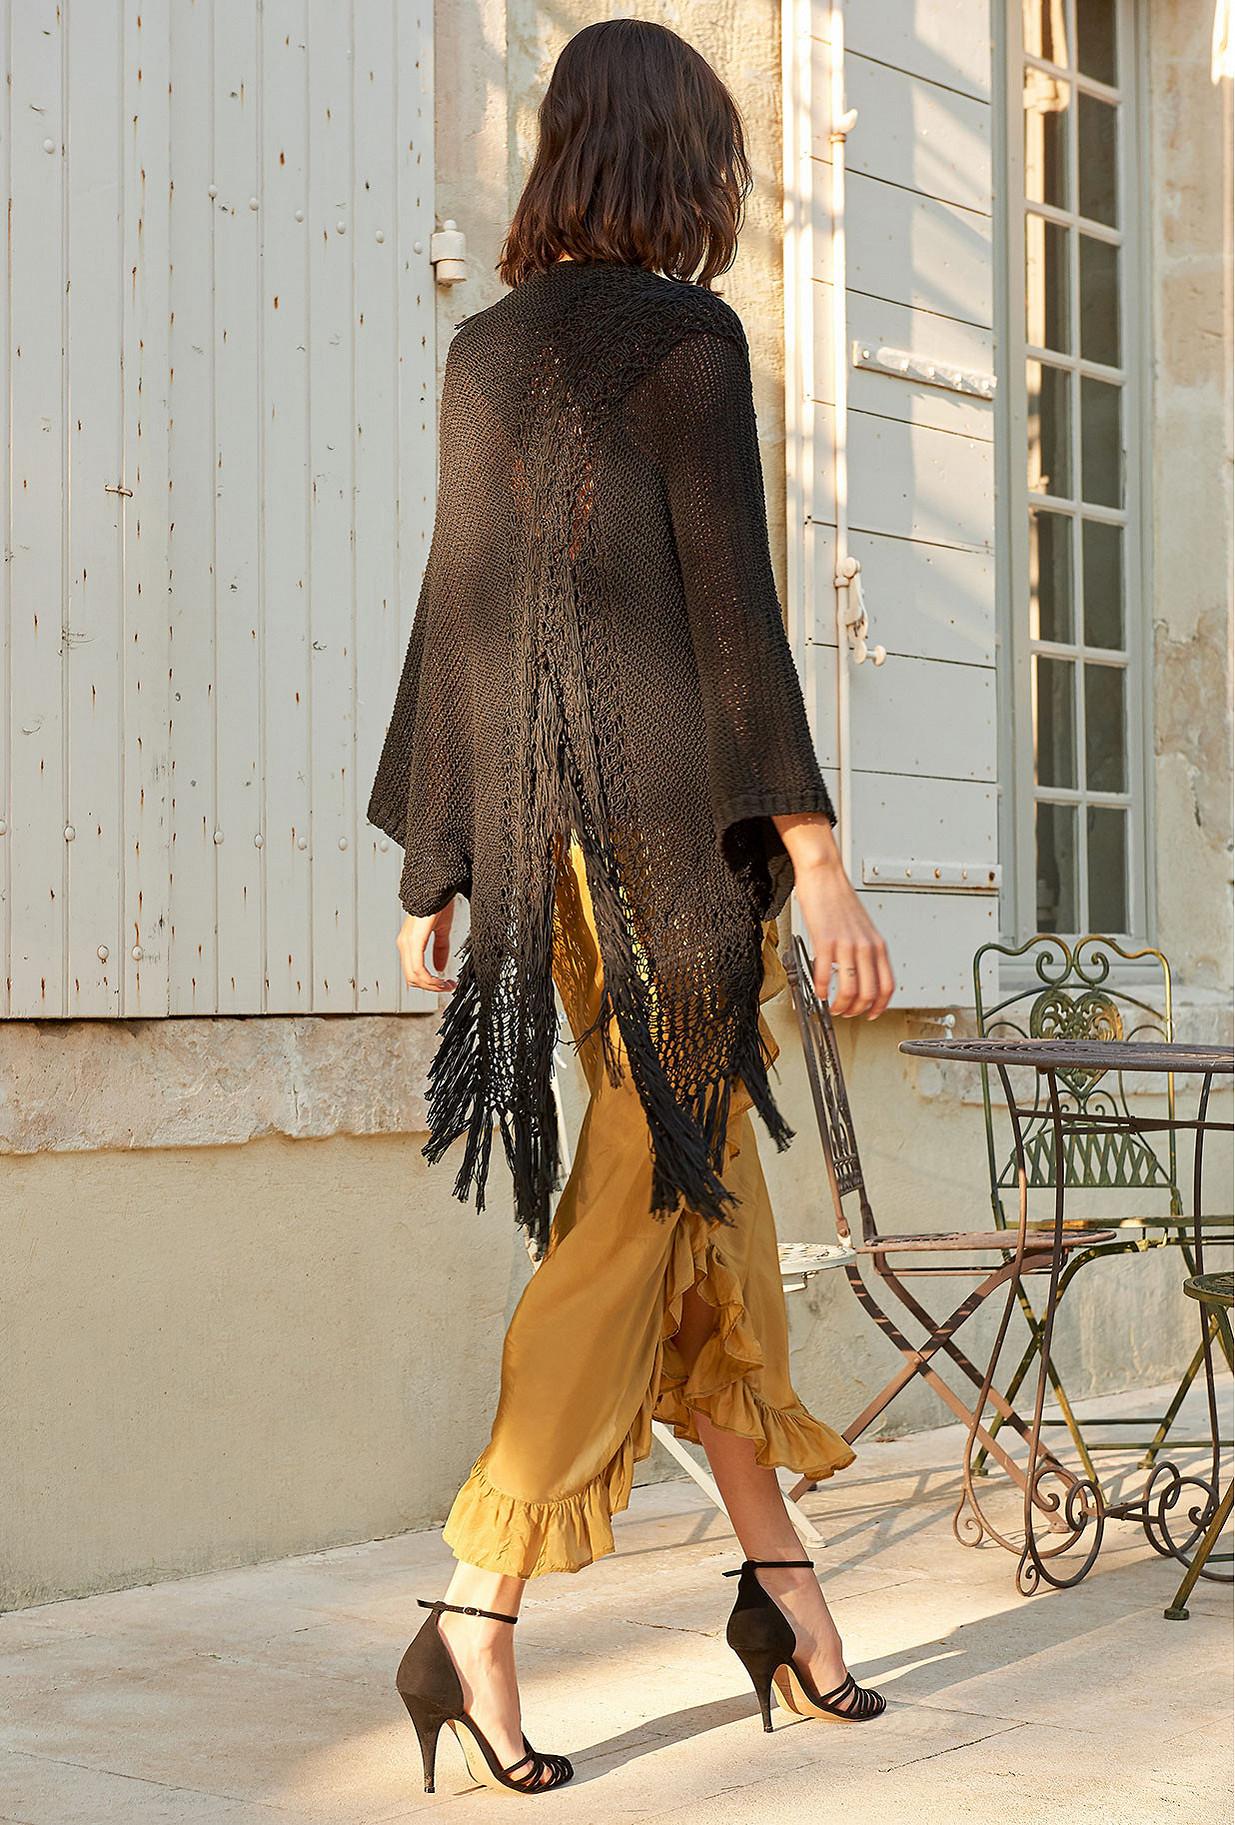 Paris clothes store Cardigan  Caicos french designer fashion Paris